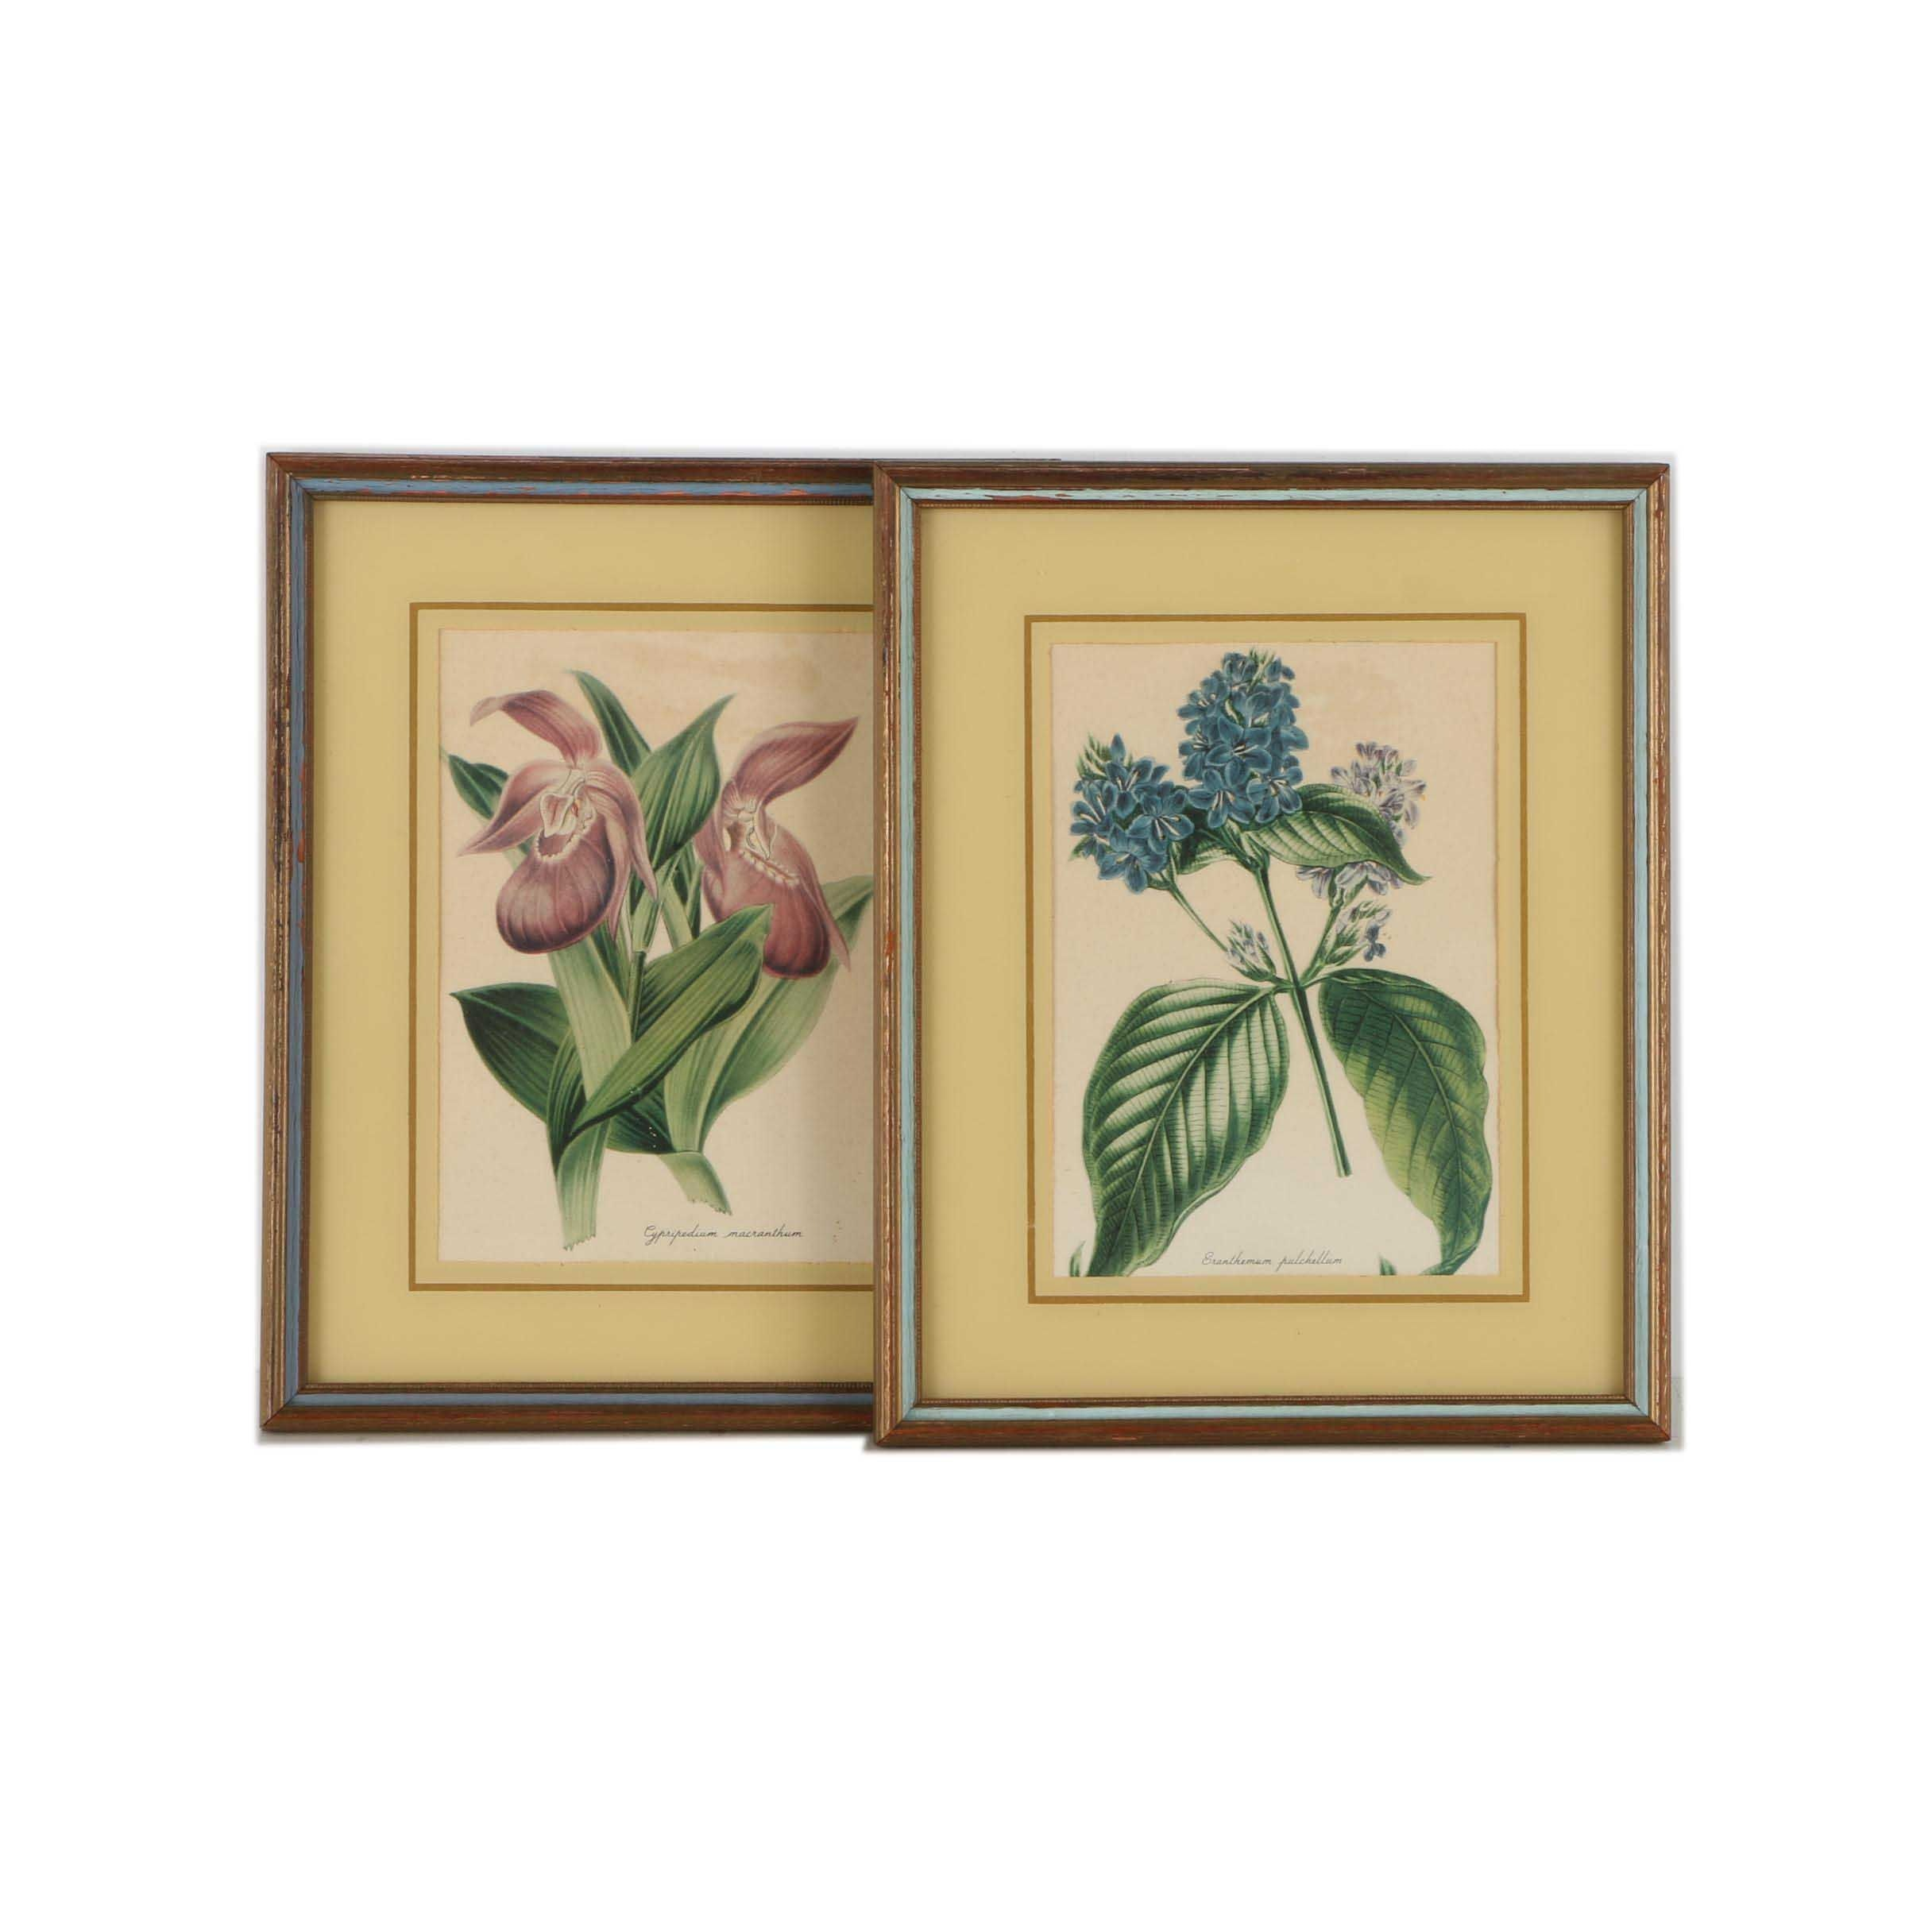 Offset Lithograph Botanical Prints